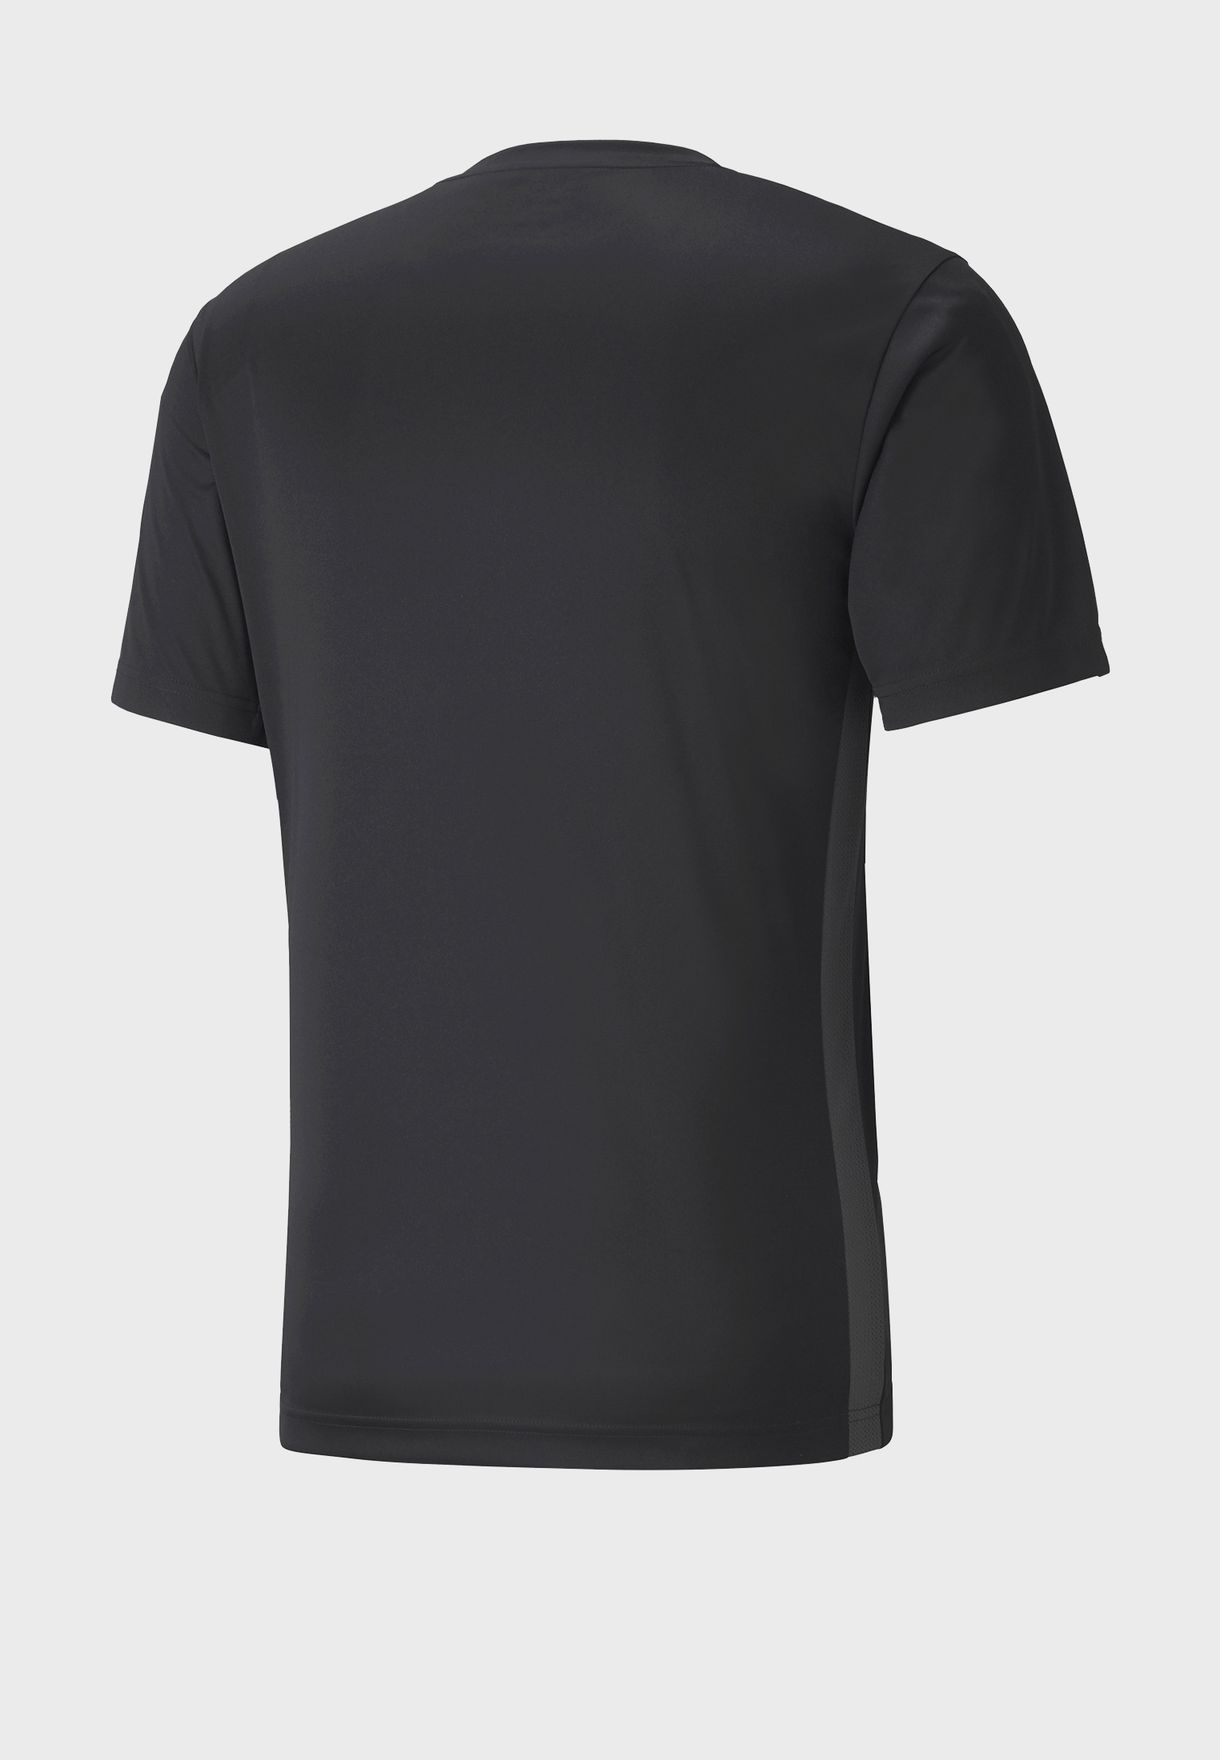 ftblPLAY Graphic T-Shirt